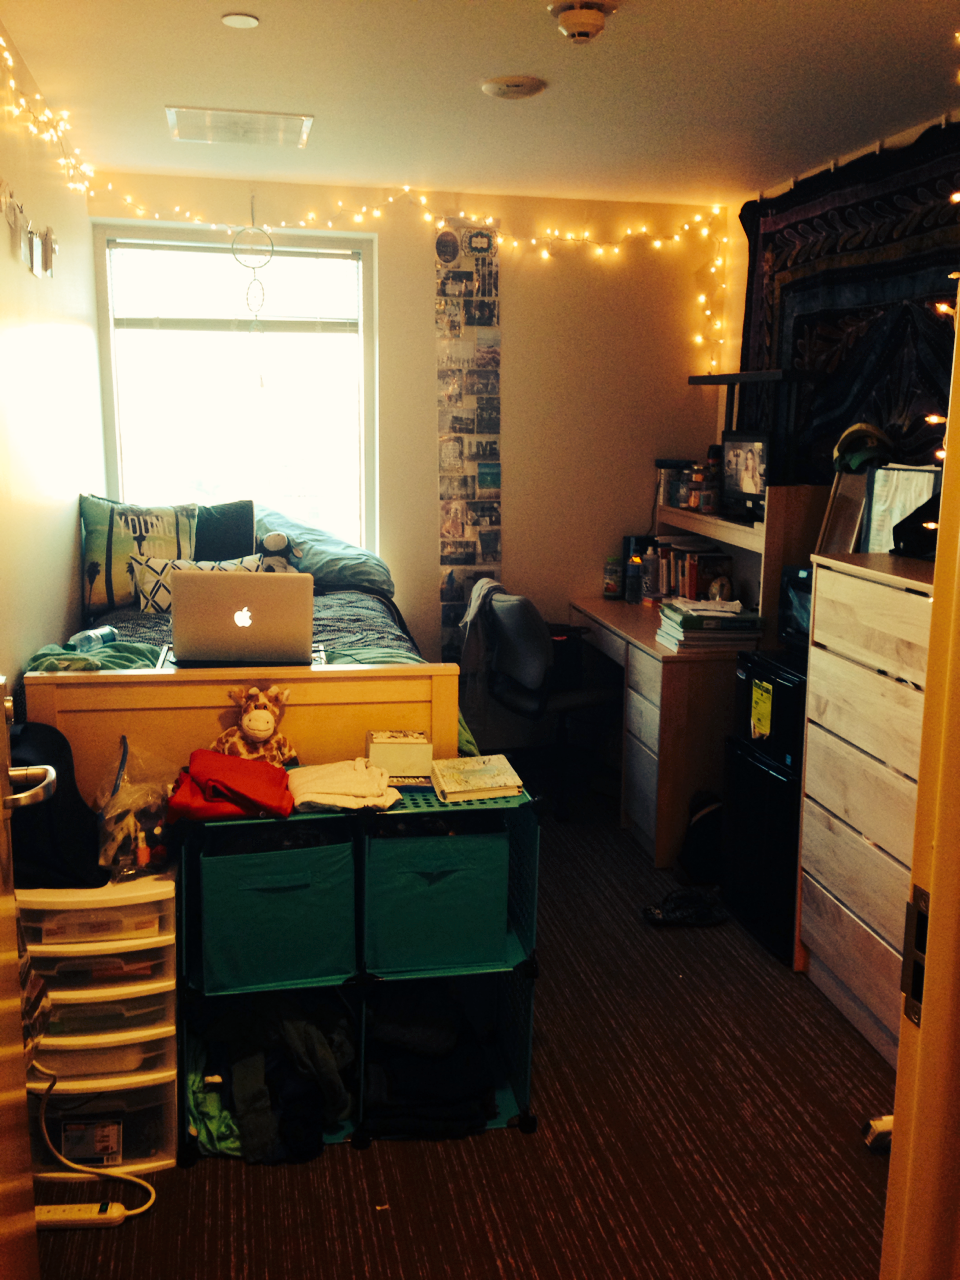 Boston University Stuvi 2 Cool Dorm Rooms Dorm Rooms Dorm